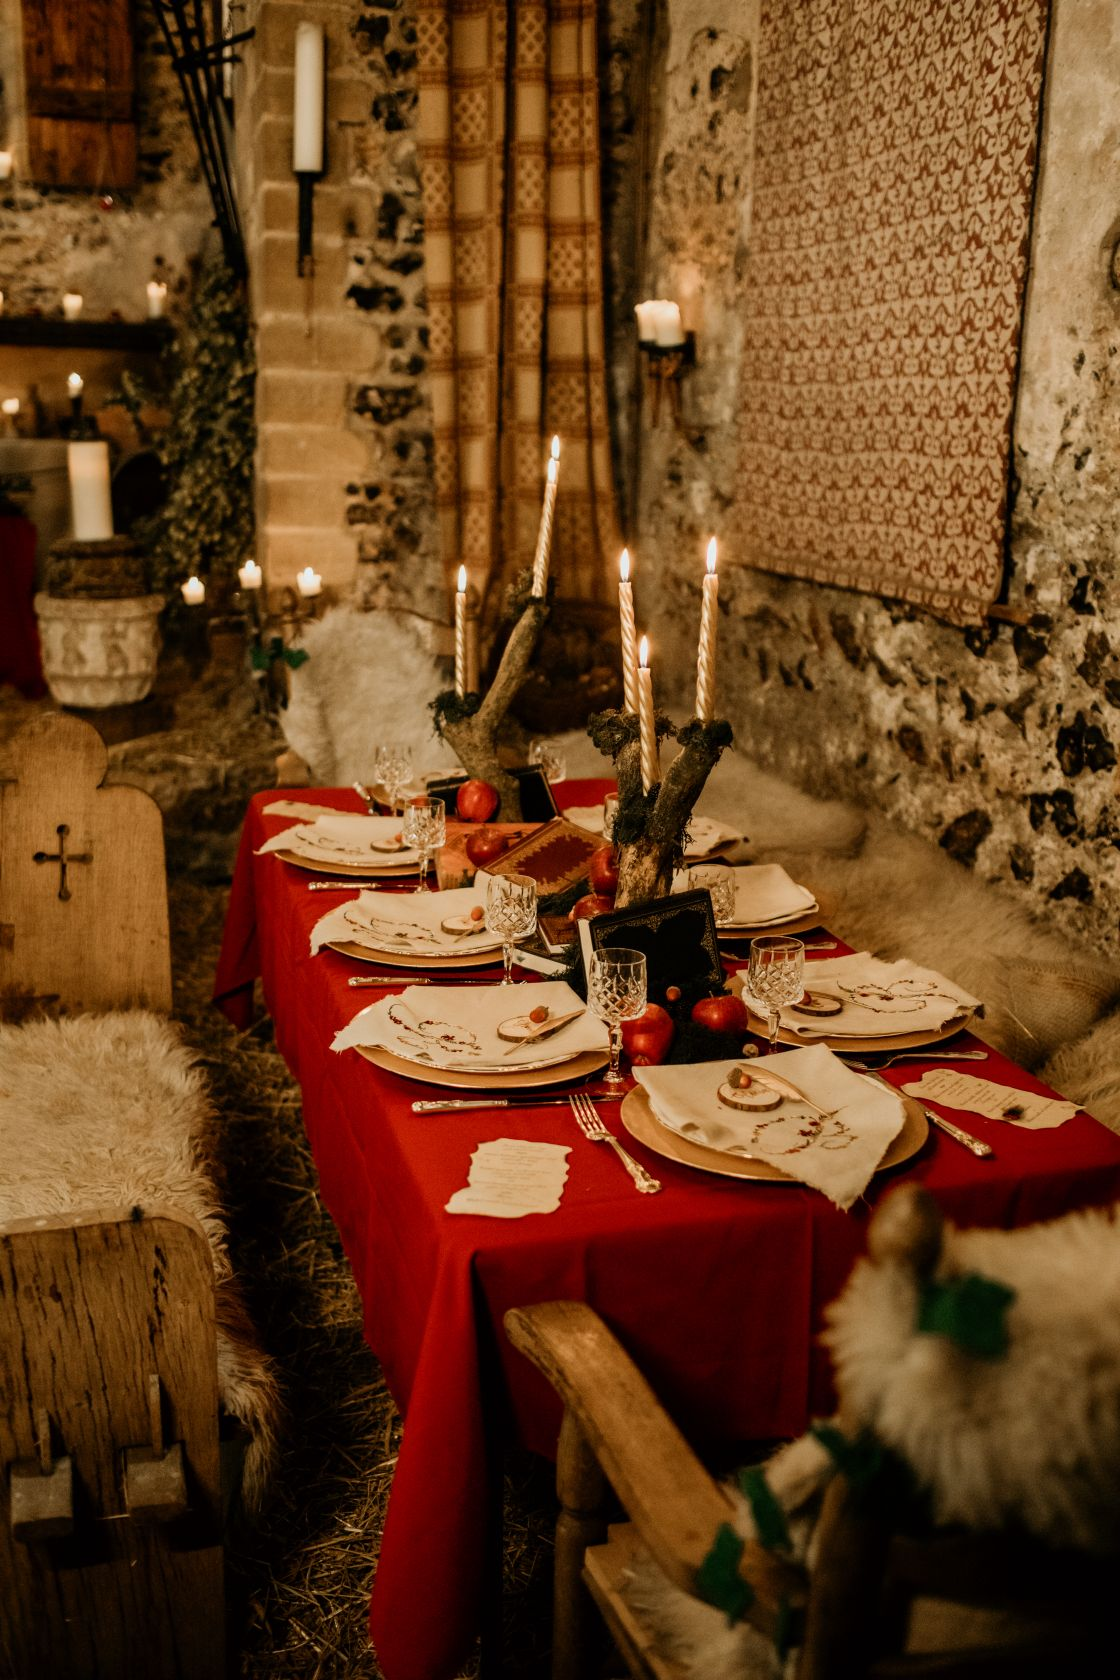 alternative fairytale wedding- snow white wedding- charlotte laurie designs-chloe mary photo- unconventional wedding- alternative wedding inspiration- alternative wedding table styling